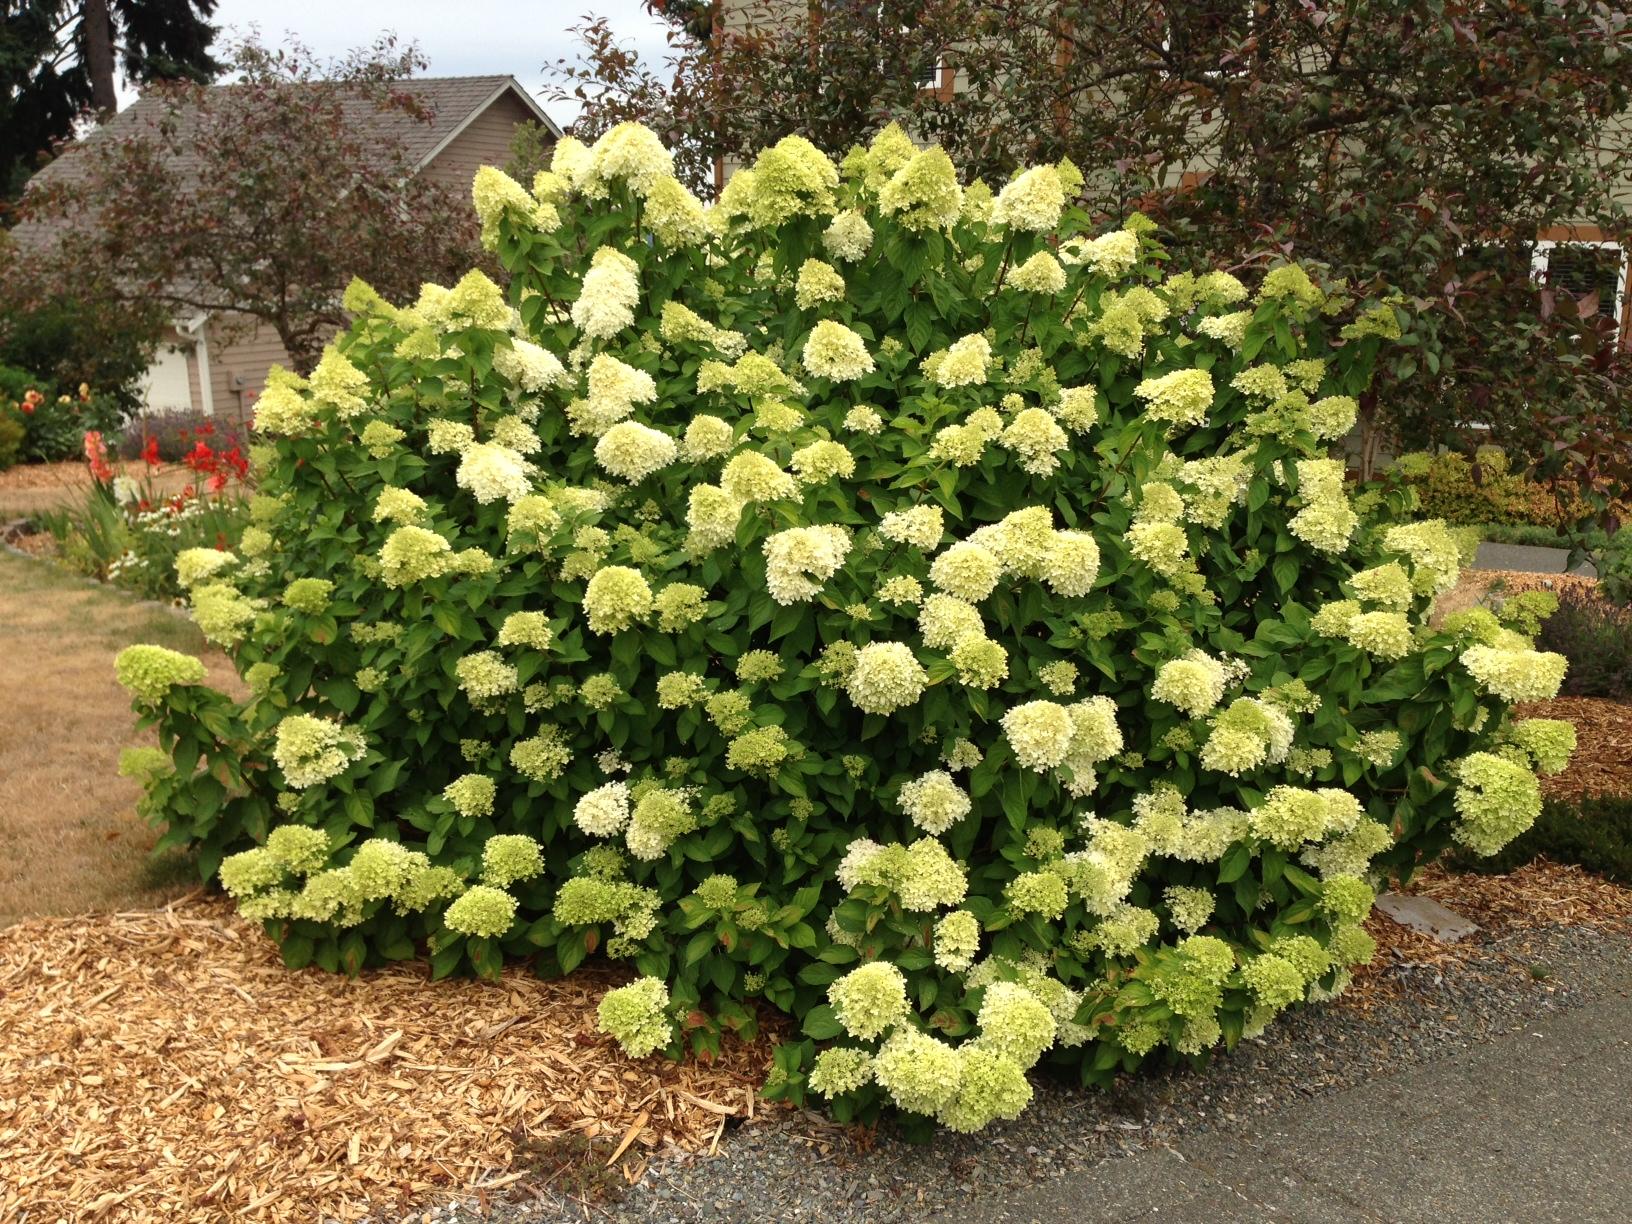 Pacific Northwest Gardening Tips For The Santa Cruz Mountains